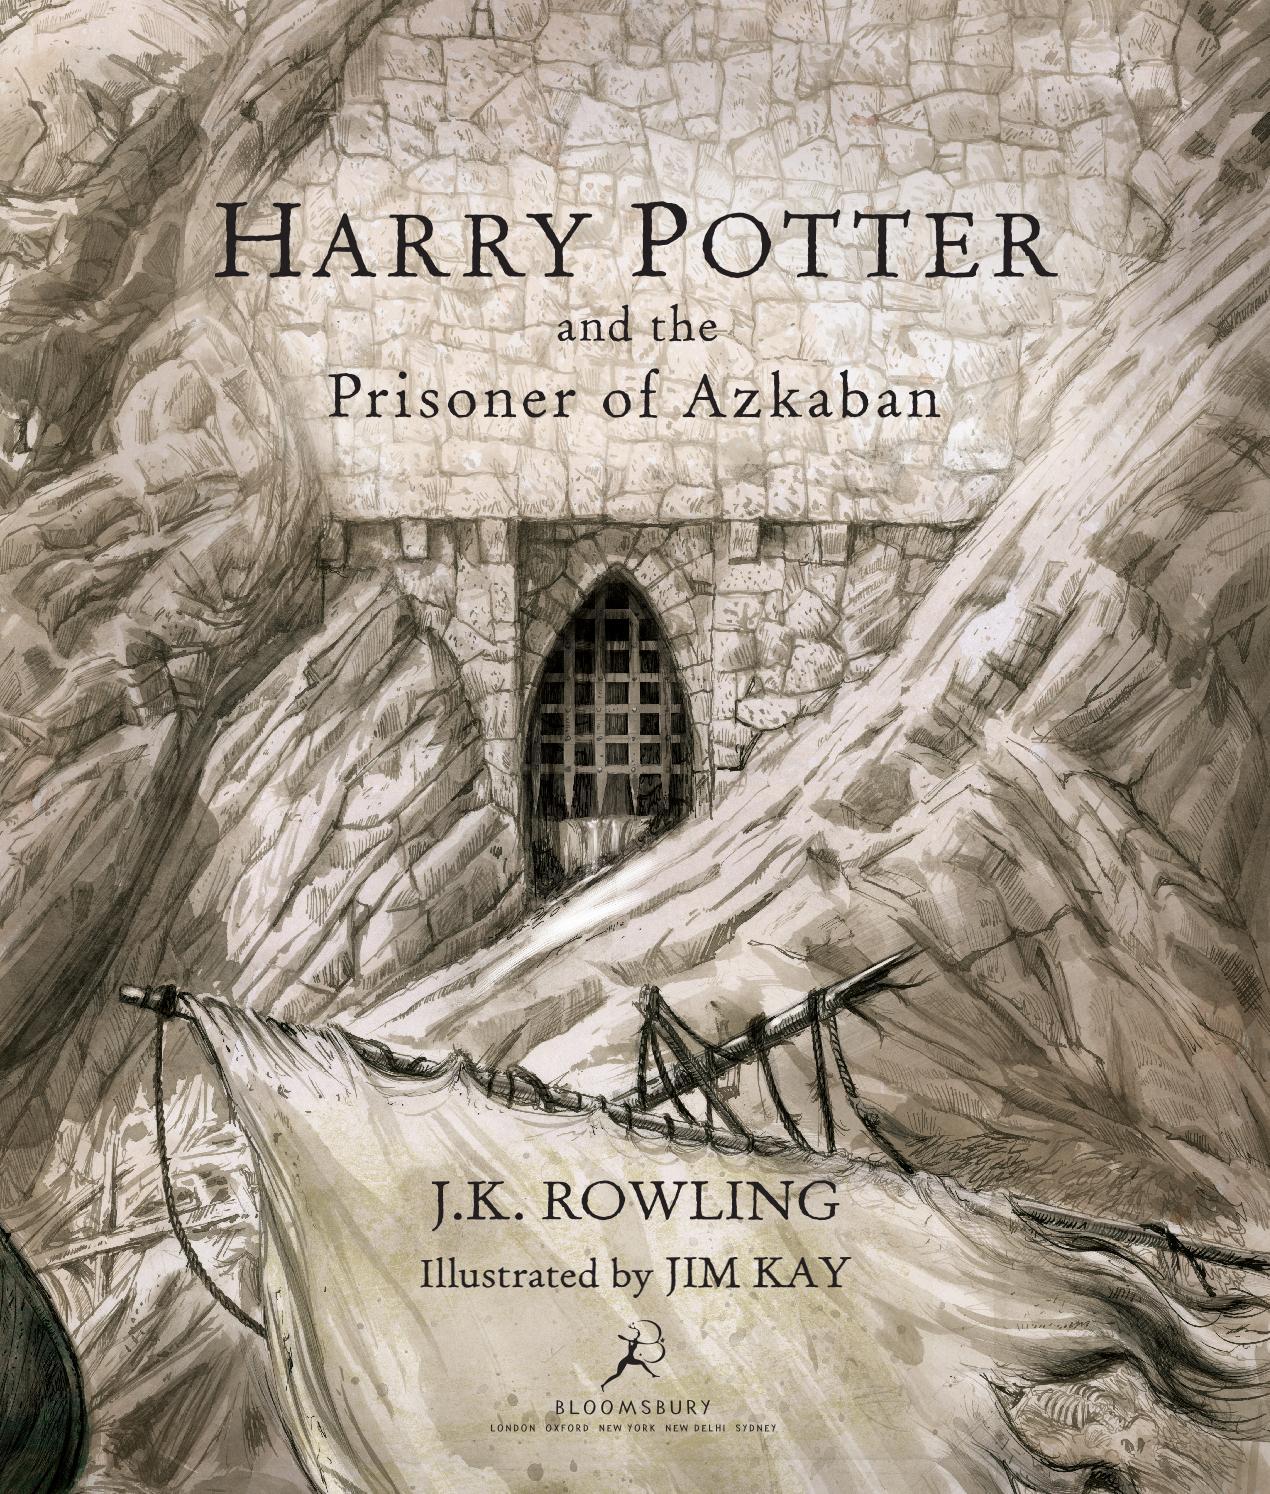 Prisoner of azkaban harry and pdf potter the